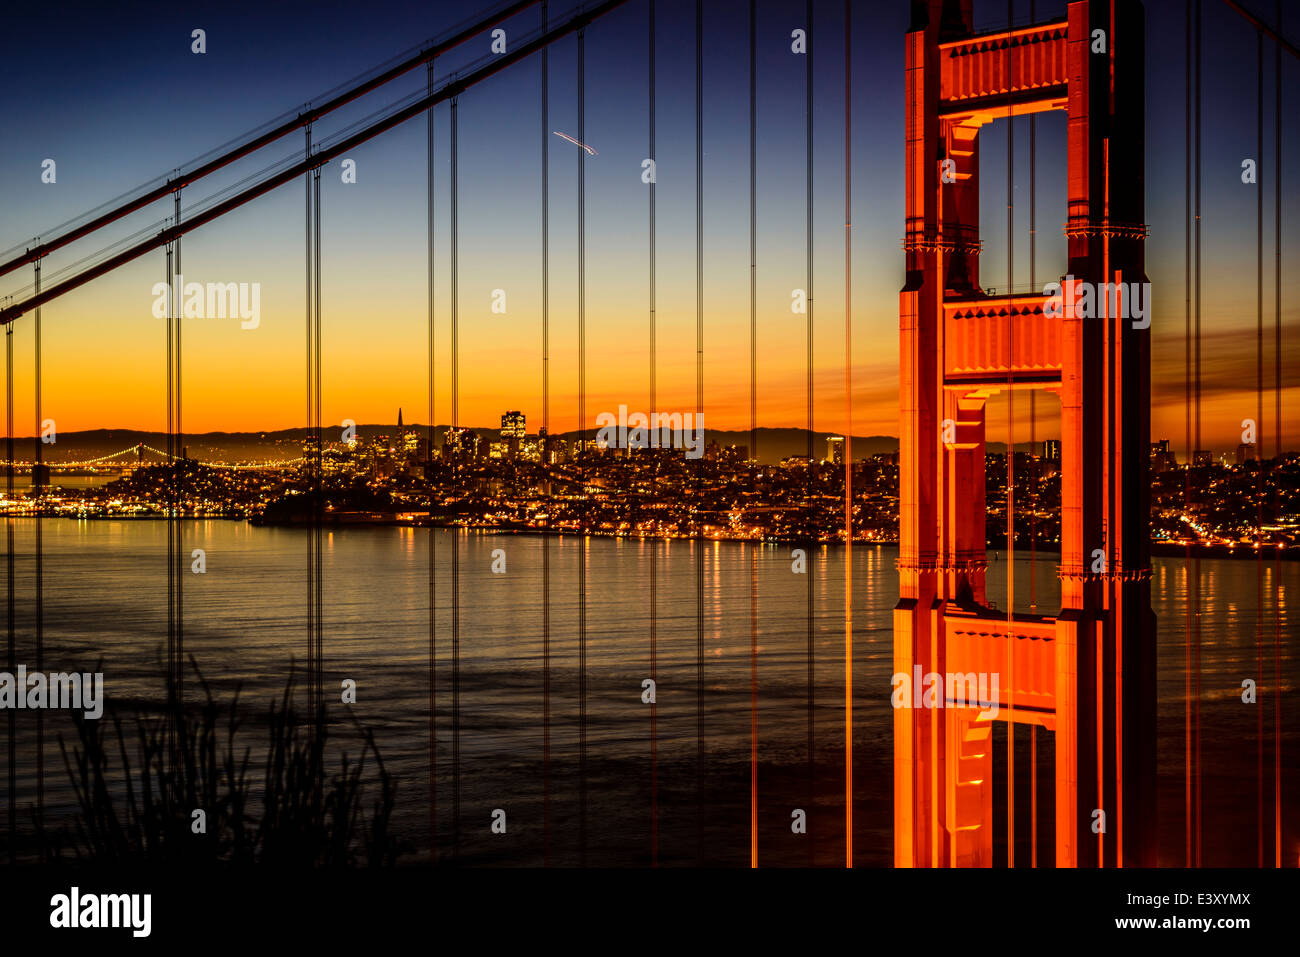 Golden Gate Bridge et San Francisco skyline lit up at night, San Francisco, California, United States Photo Stock